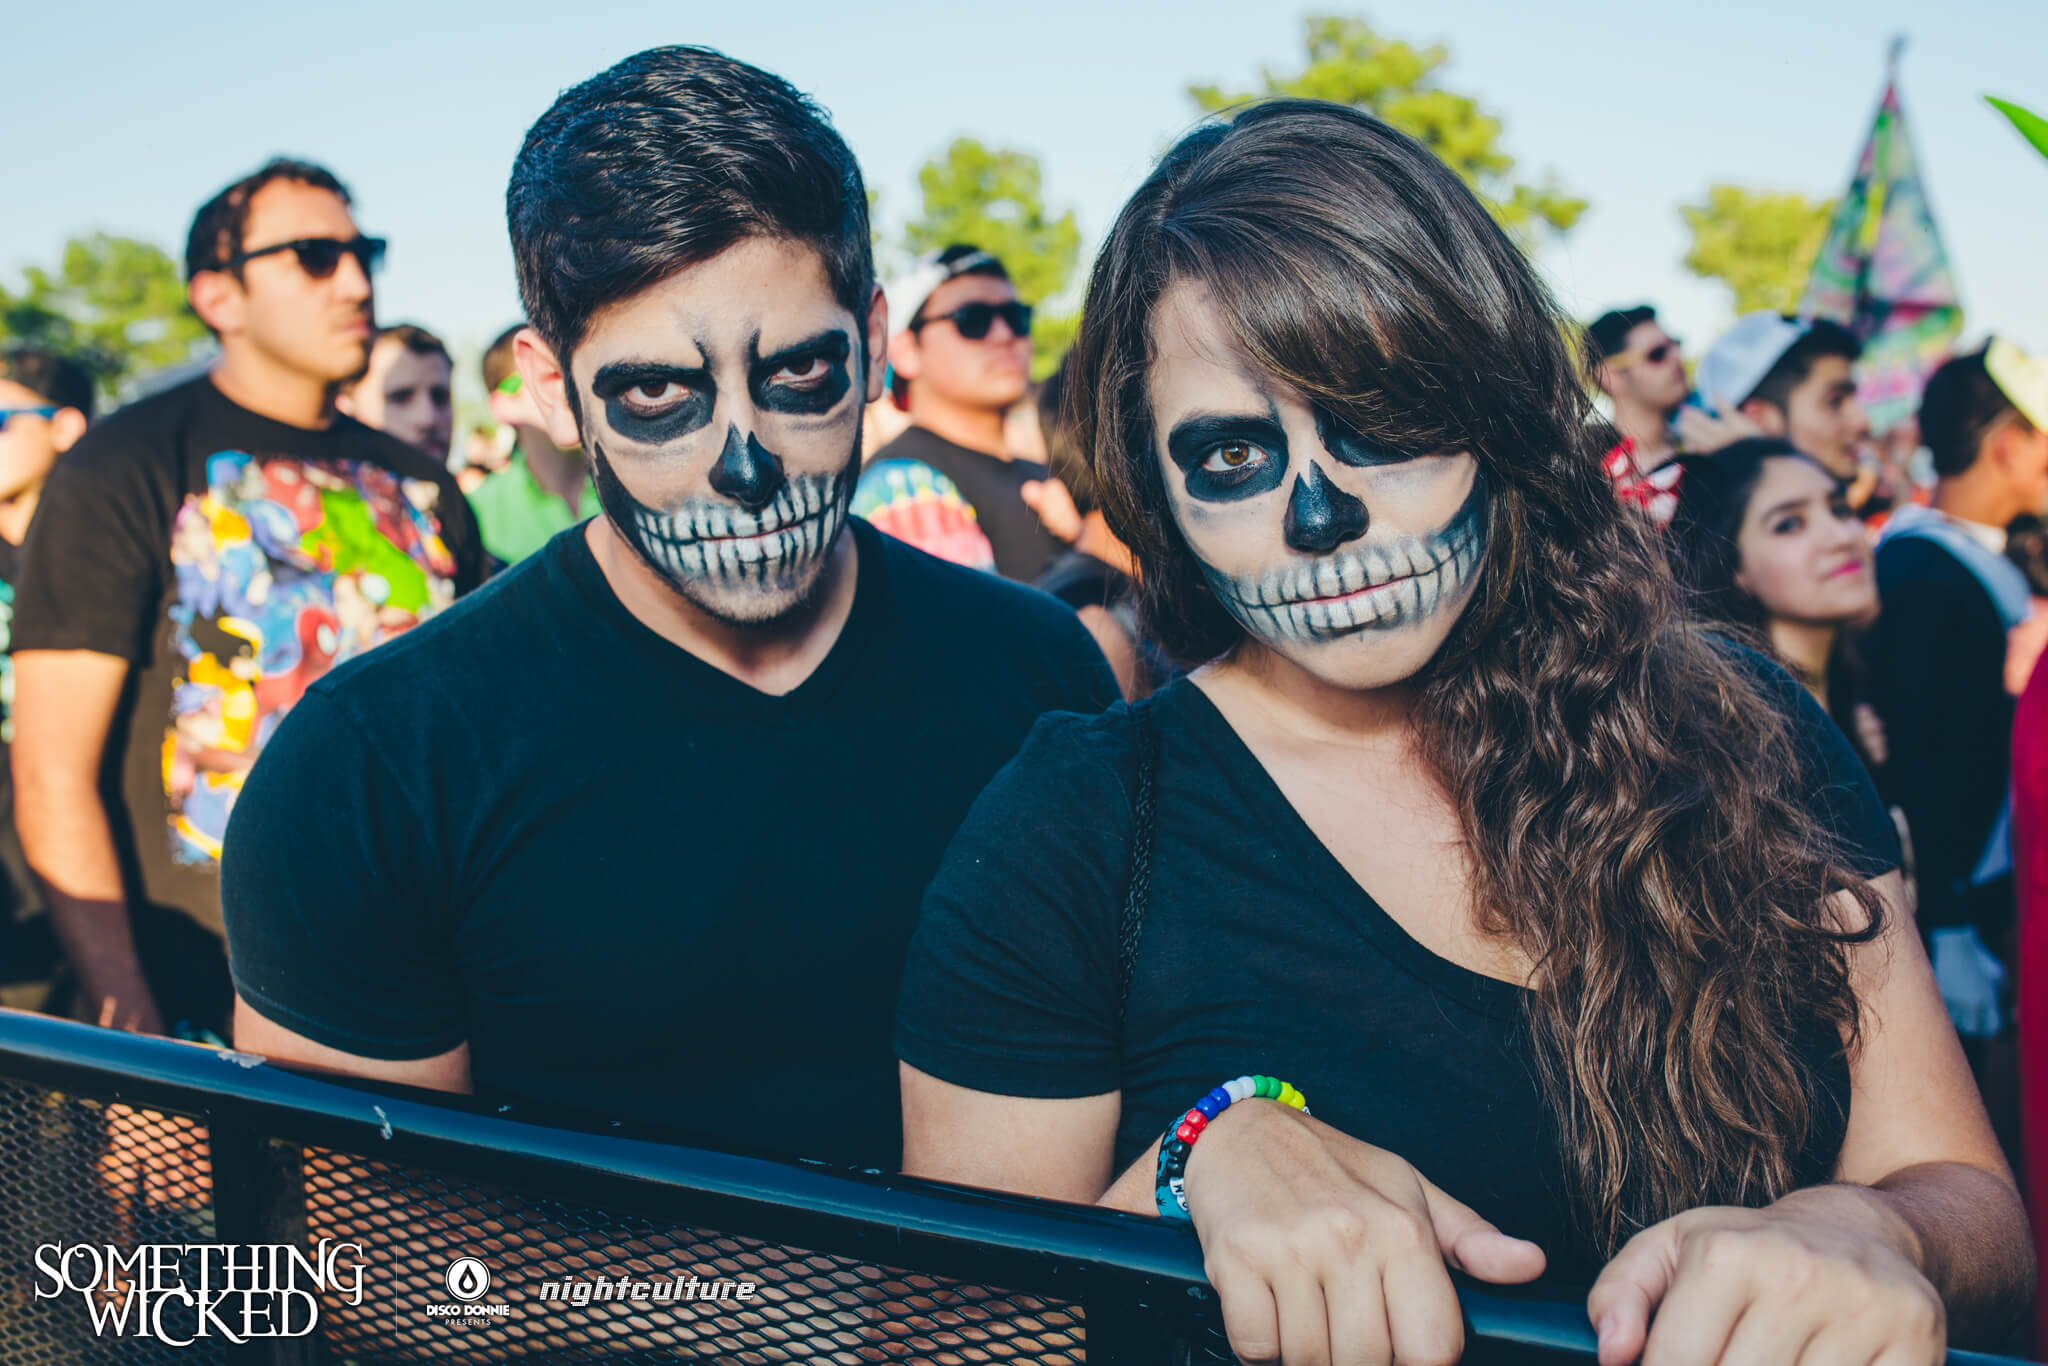 skeleton halloween makeup at something wicked festival